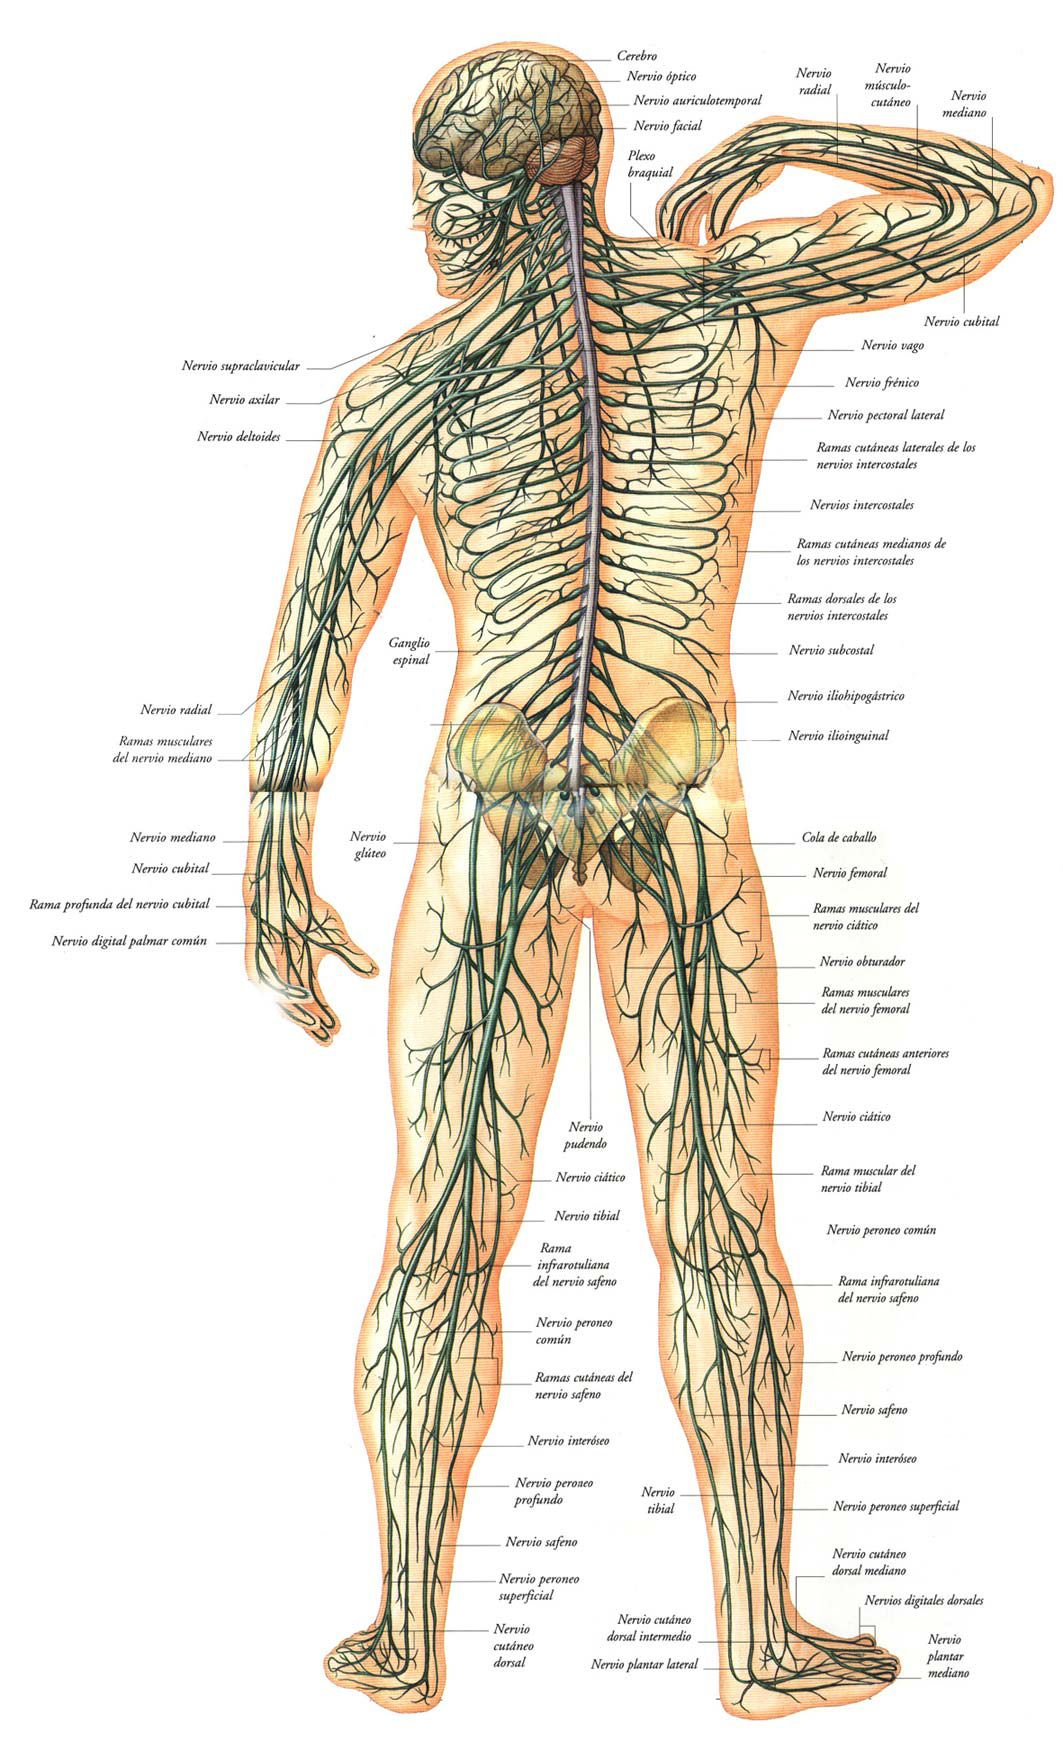 Sistema Nervioso, Noi Group y Twitter | Neuro | Pinterest | Sistema ...